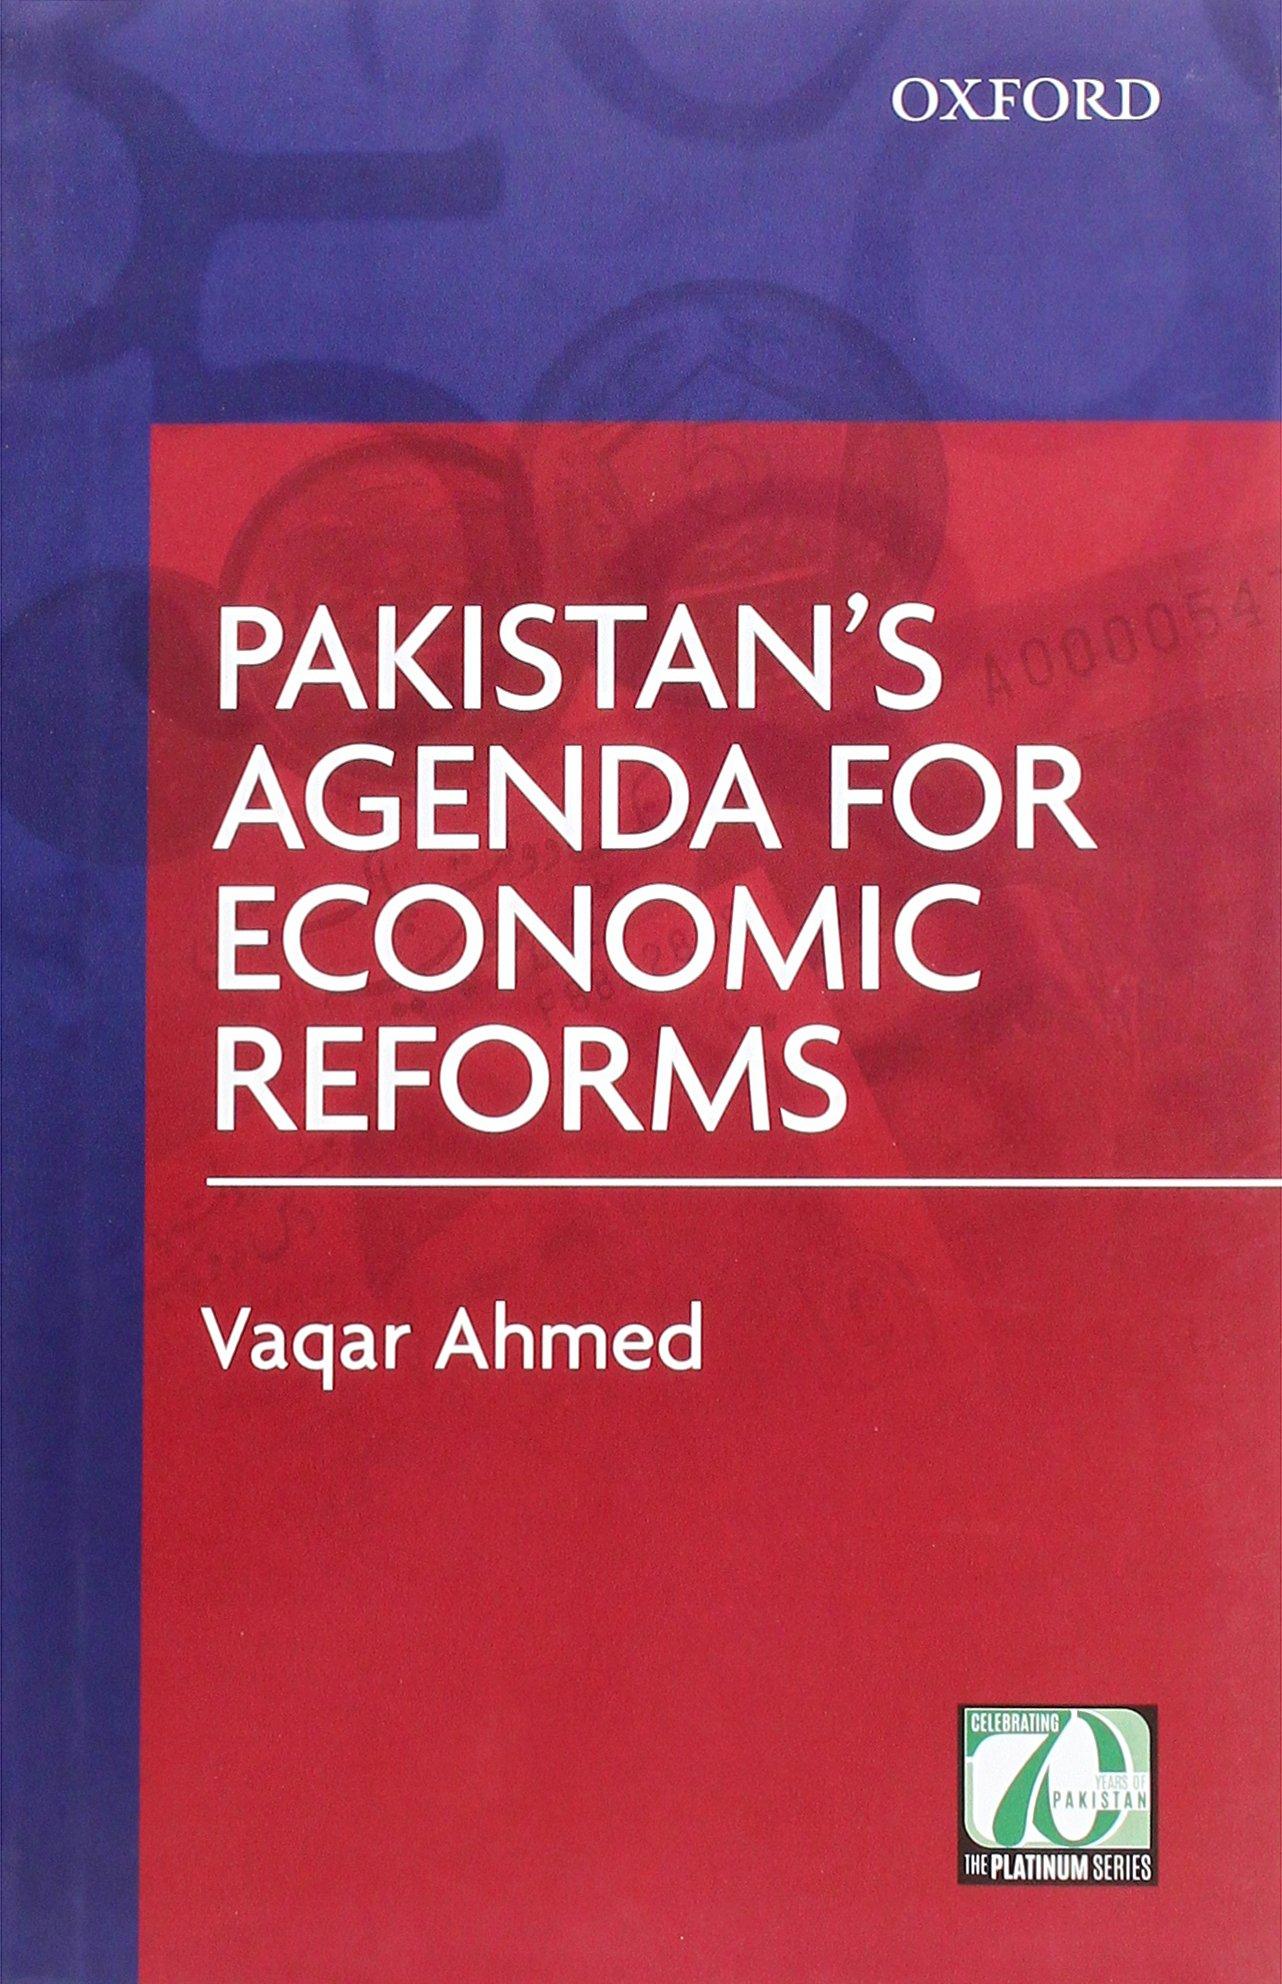 Pakistans Agenda for Economic Reforms: Vaqar Ahmed ...